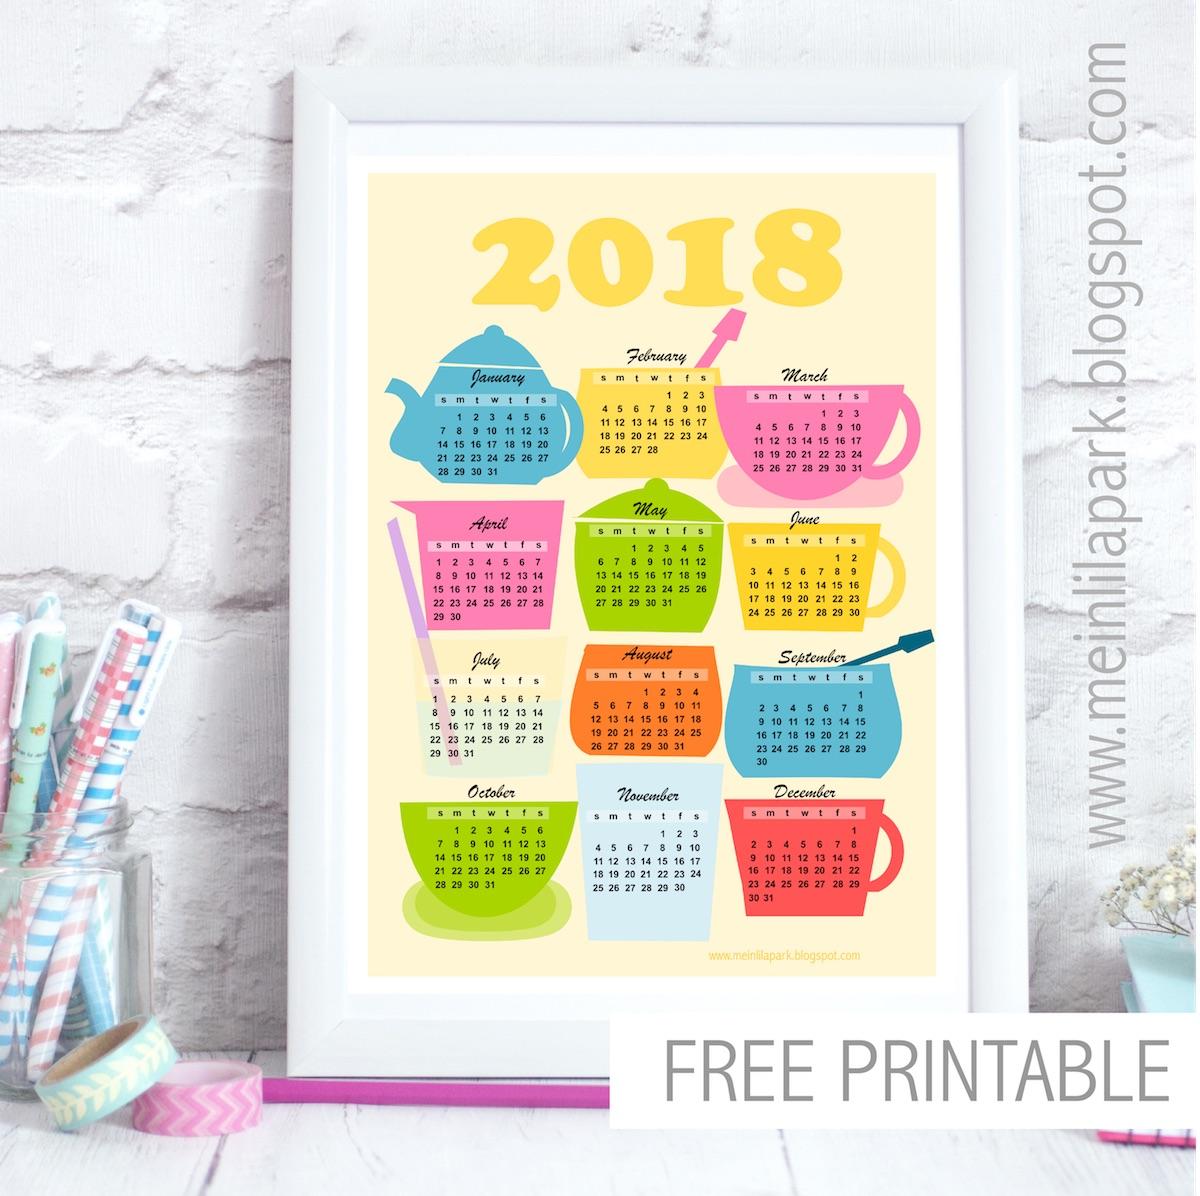 Freebies 2018